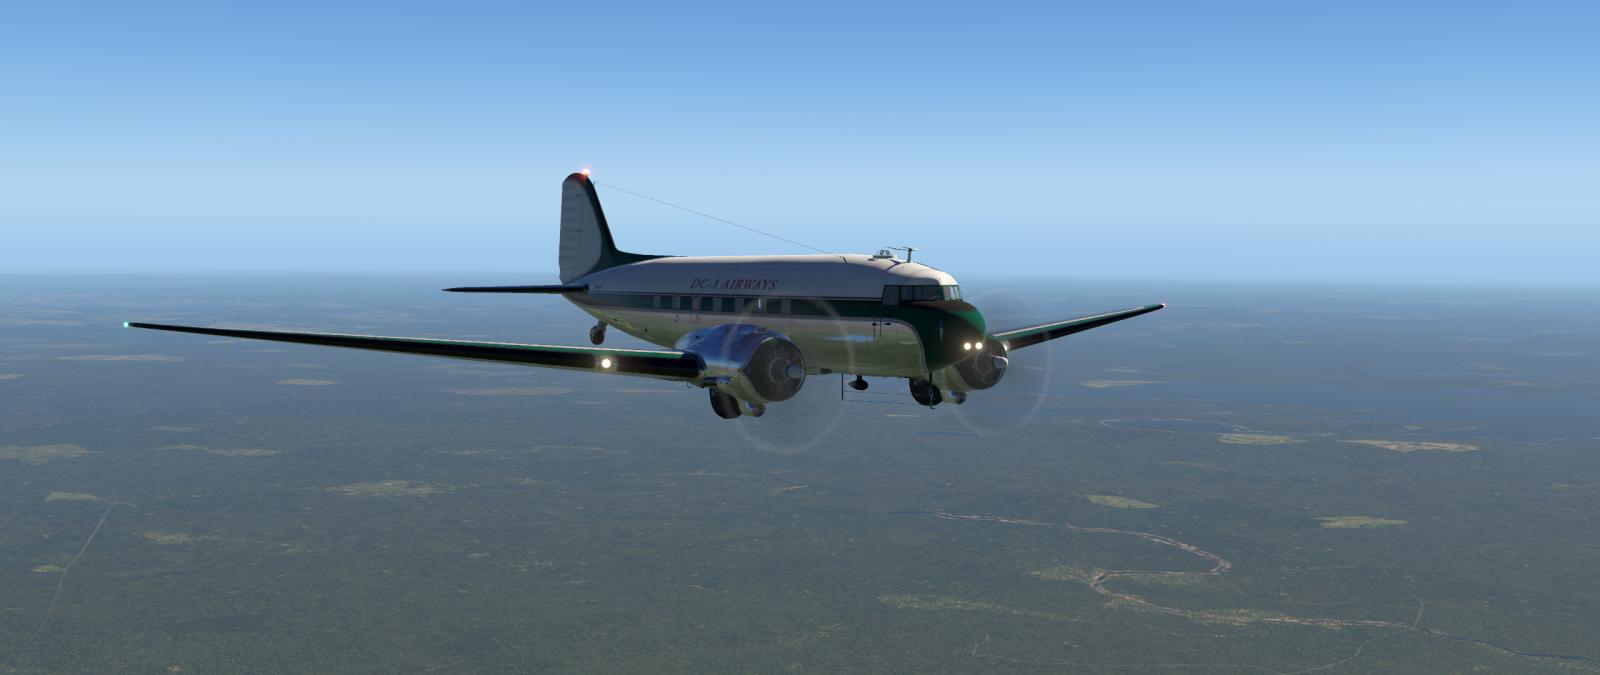 AWXDC3Beta2_2XP11 zip - General Aviation - X-Plane Org Forum